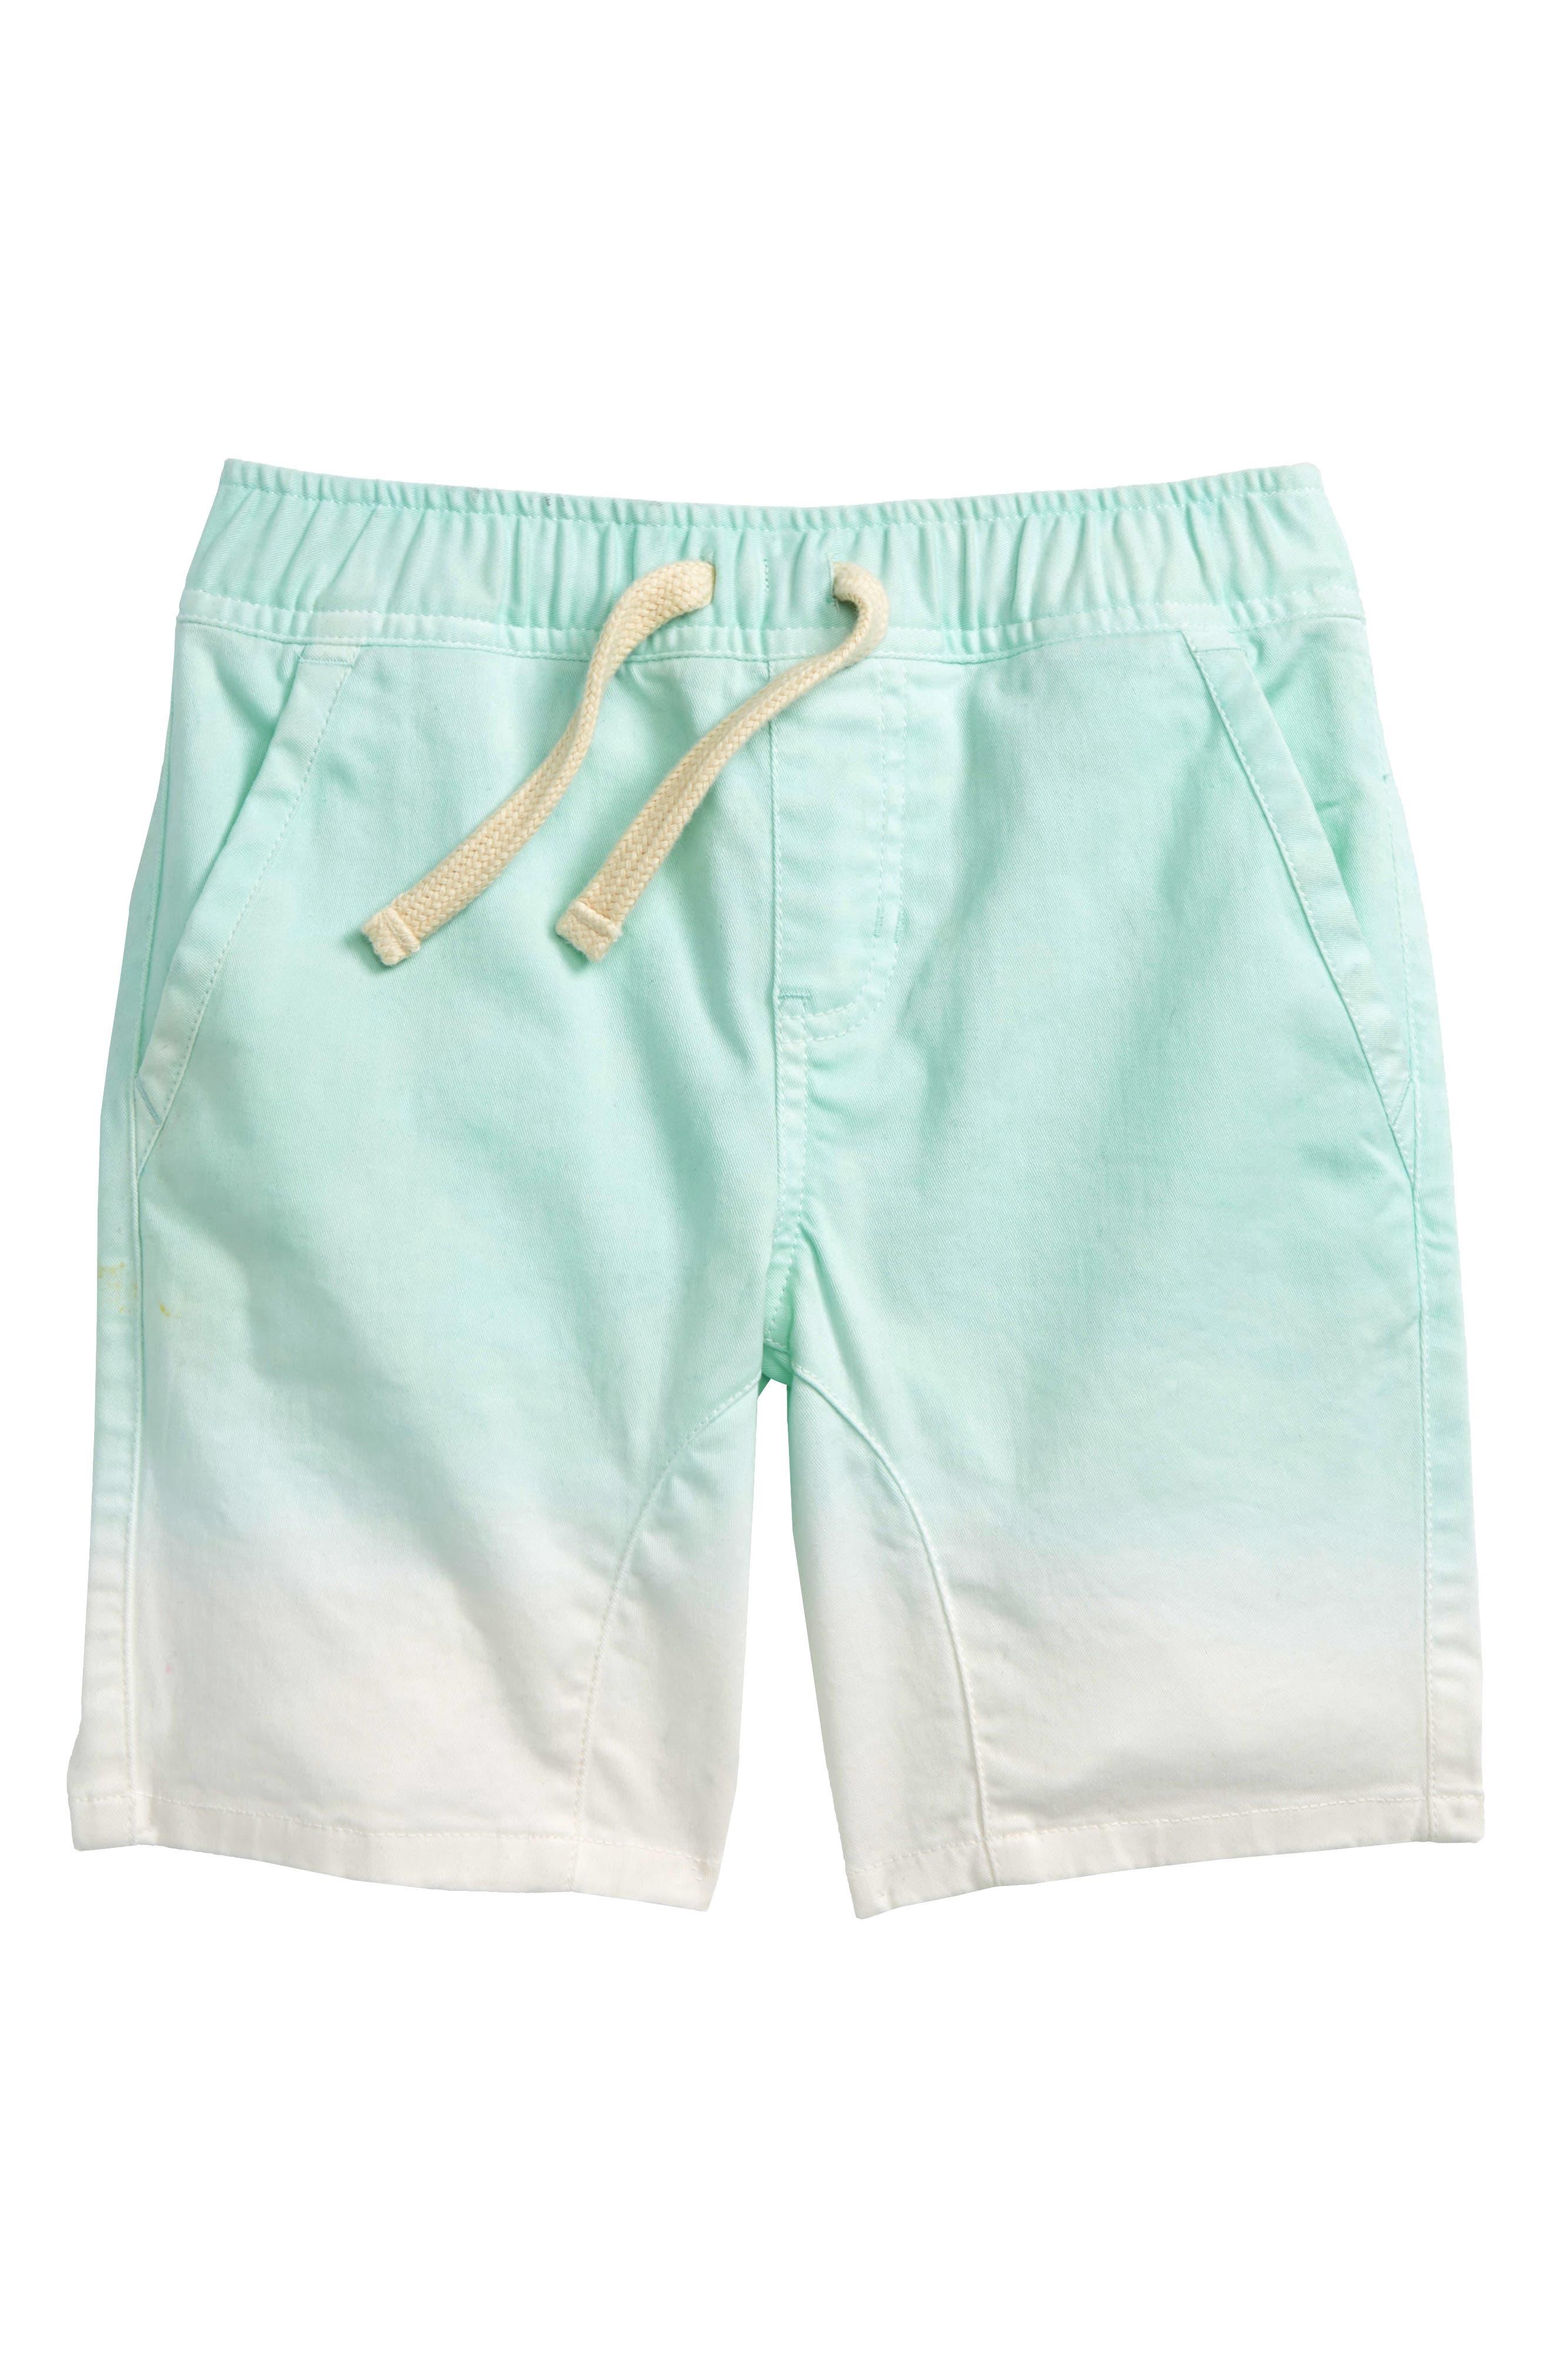 Tucker + Tate Dip Dye Knit Shorts (Toddler Boys & Little Boys)